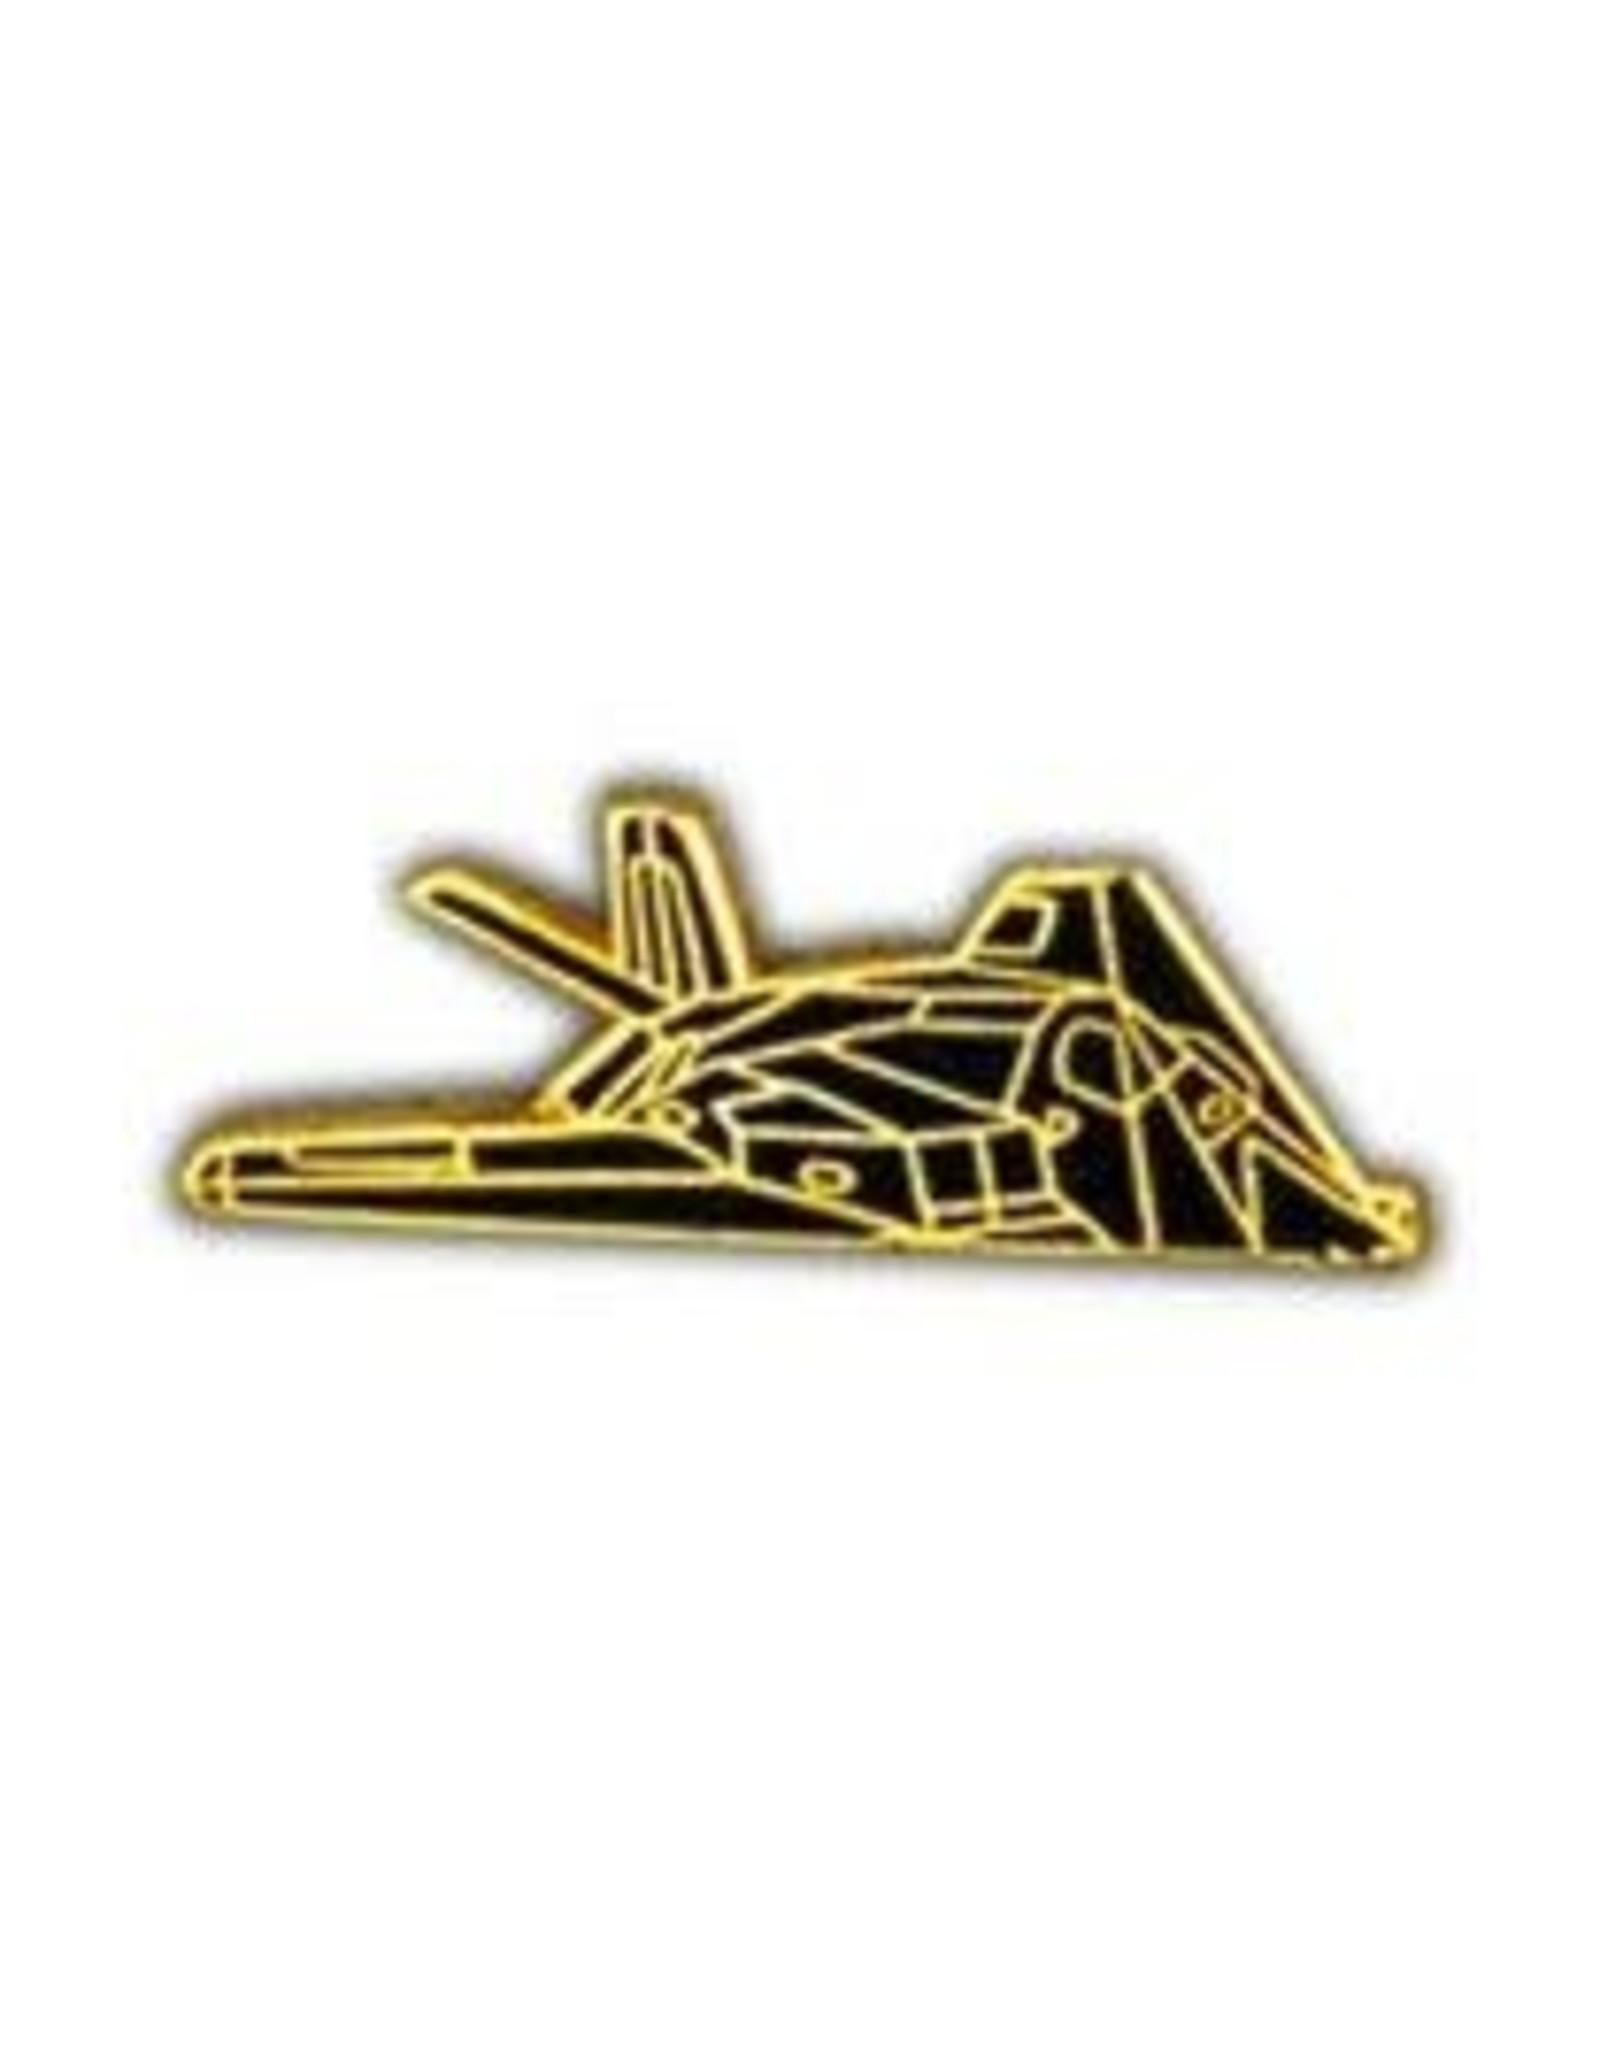 Pin - Airplane F-117 Nighthawk